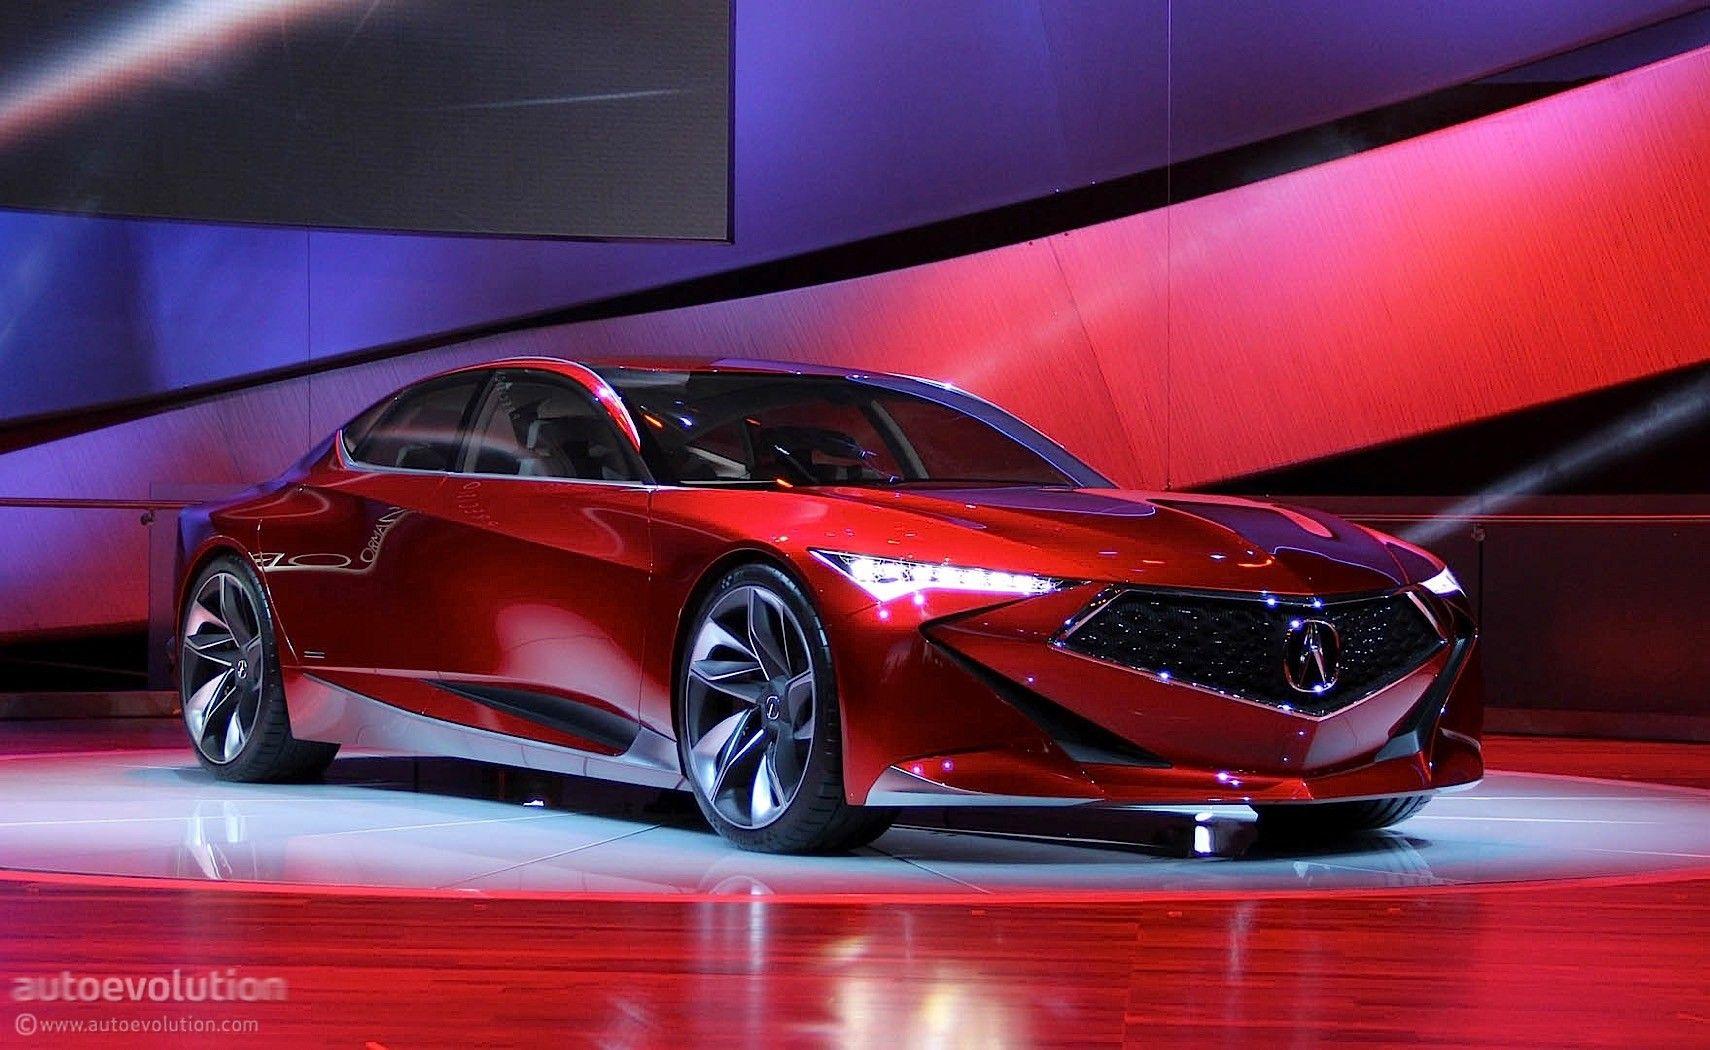 2020 Acura Rlx Acura Acura Precision Car Detailing